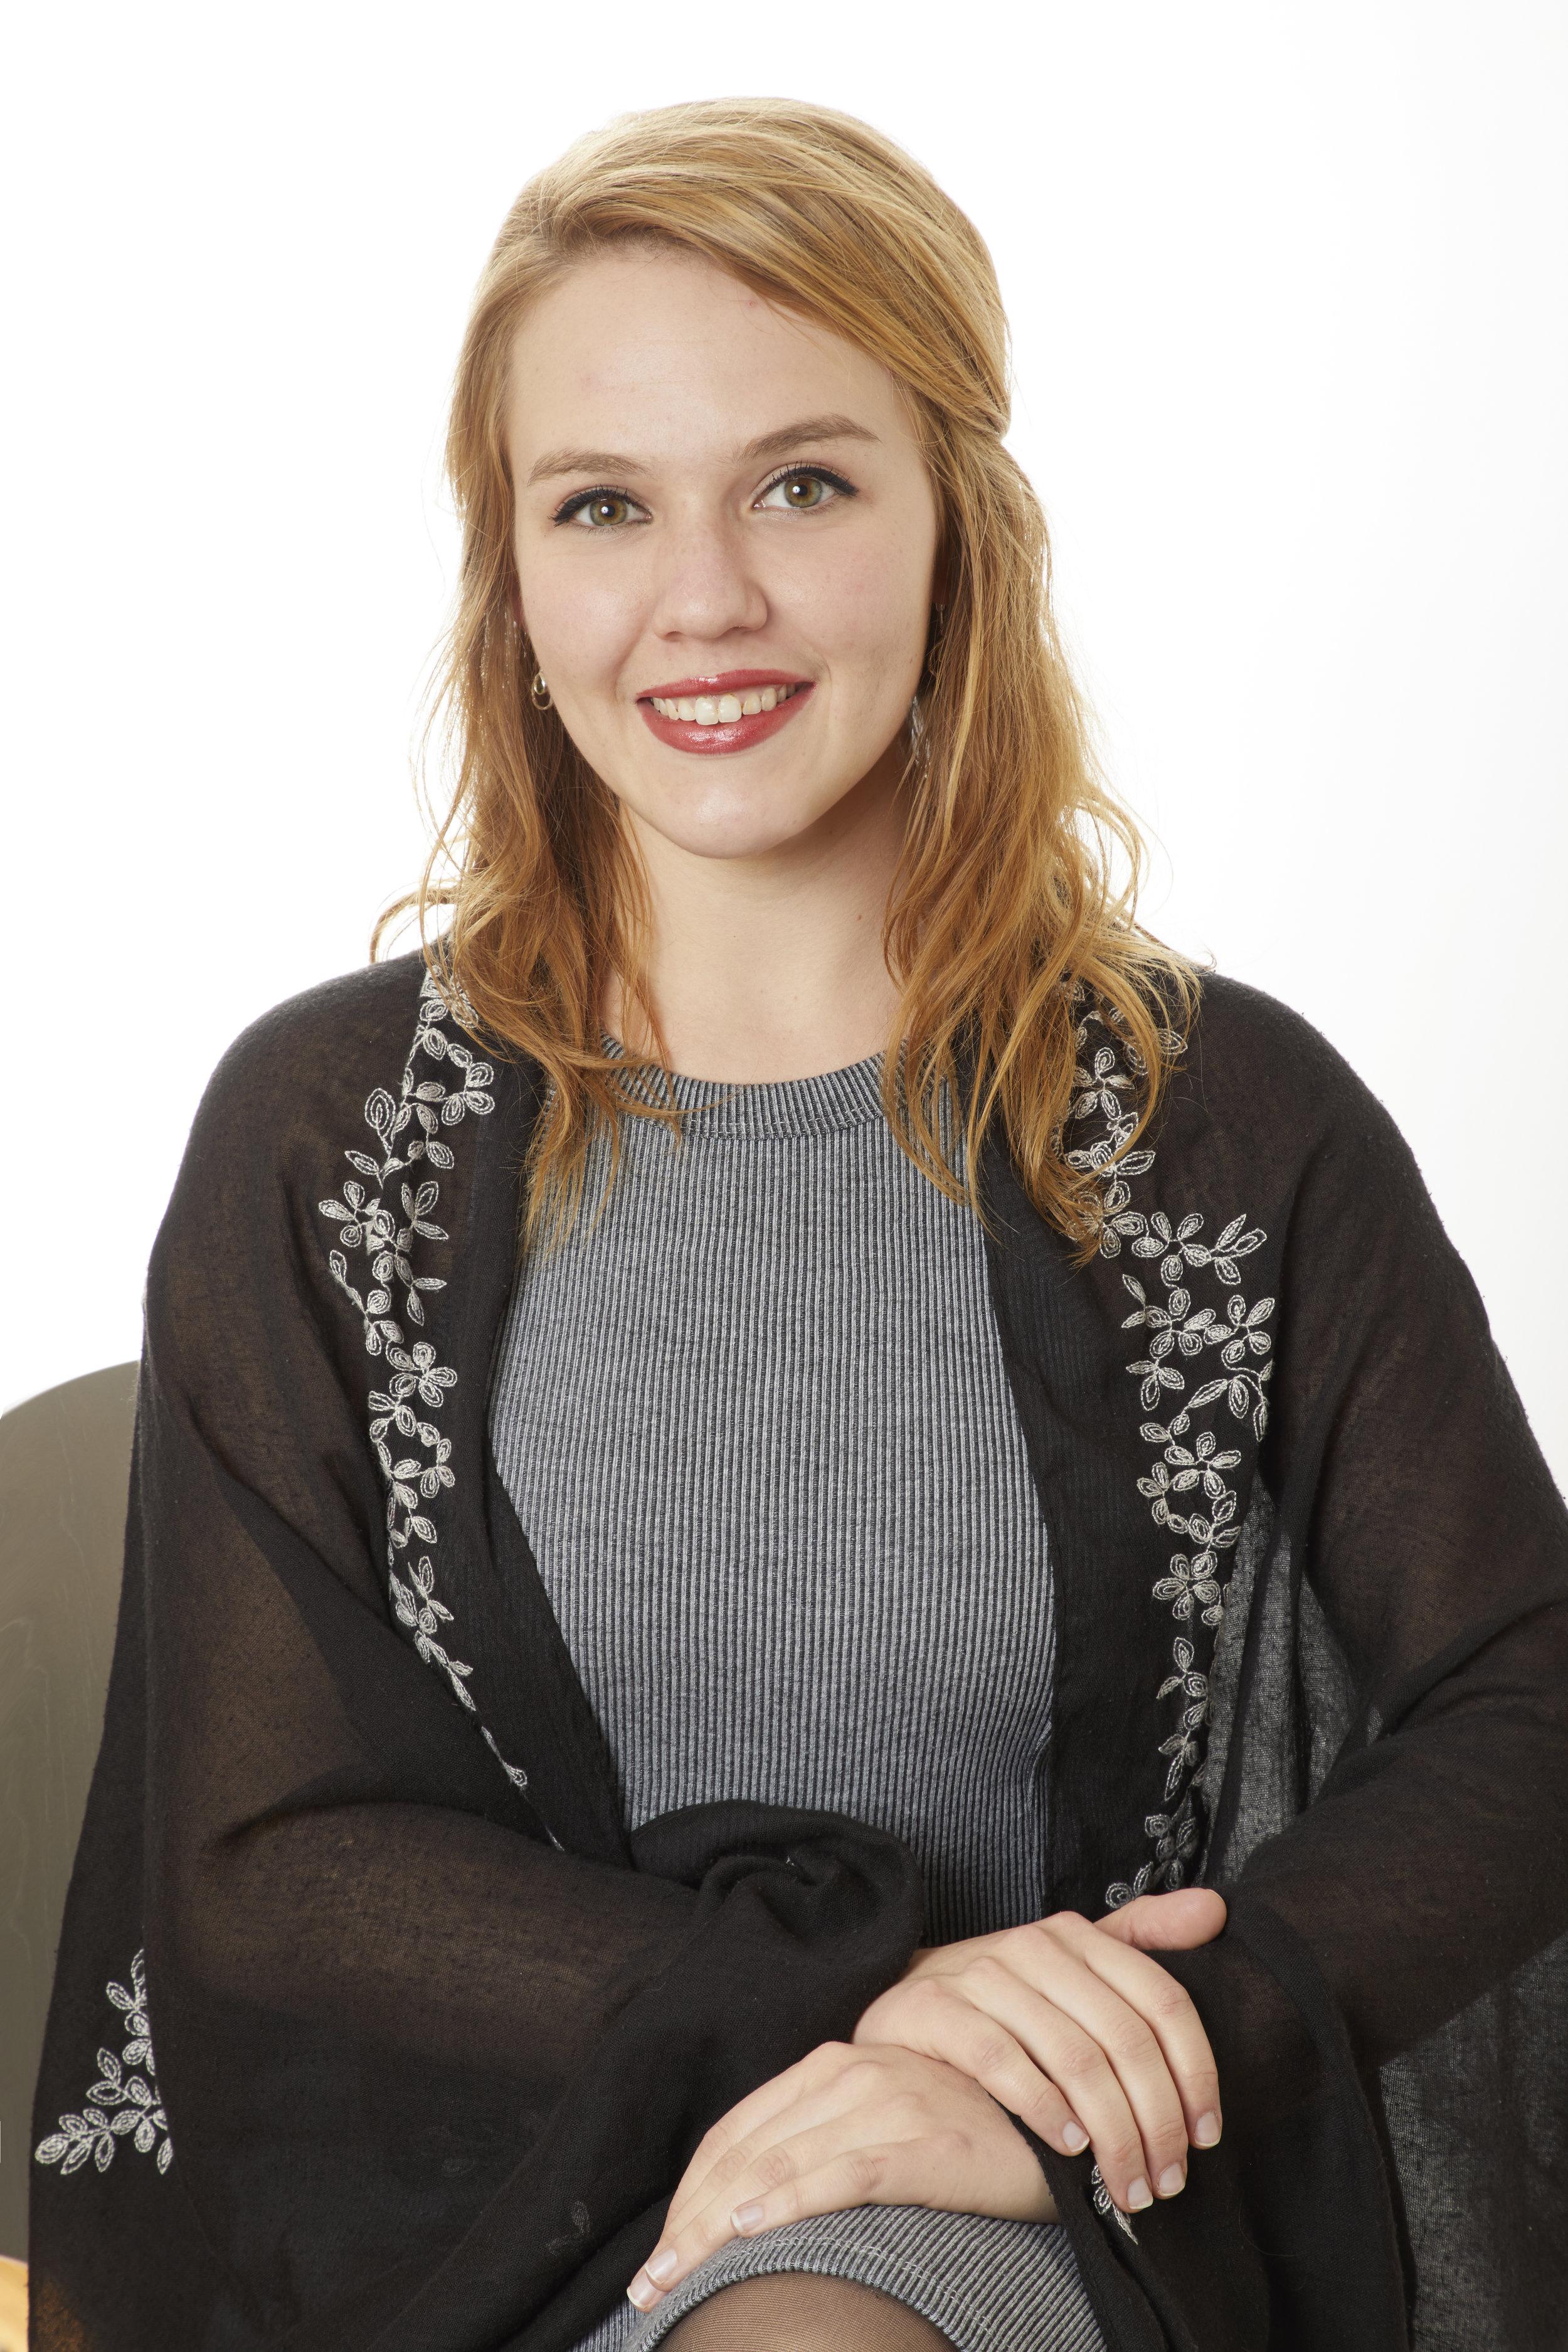 Chelsey Cioli